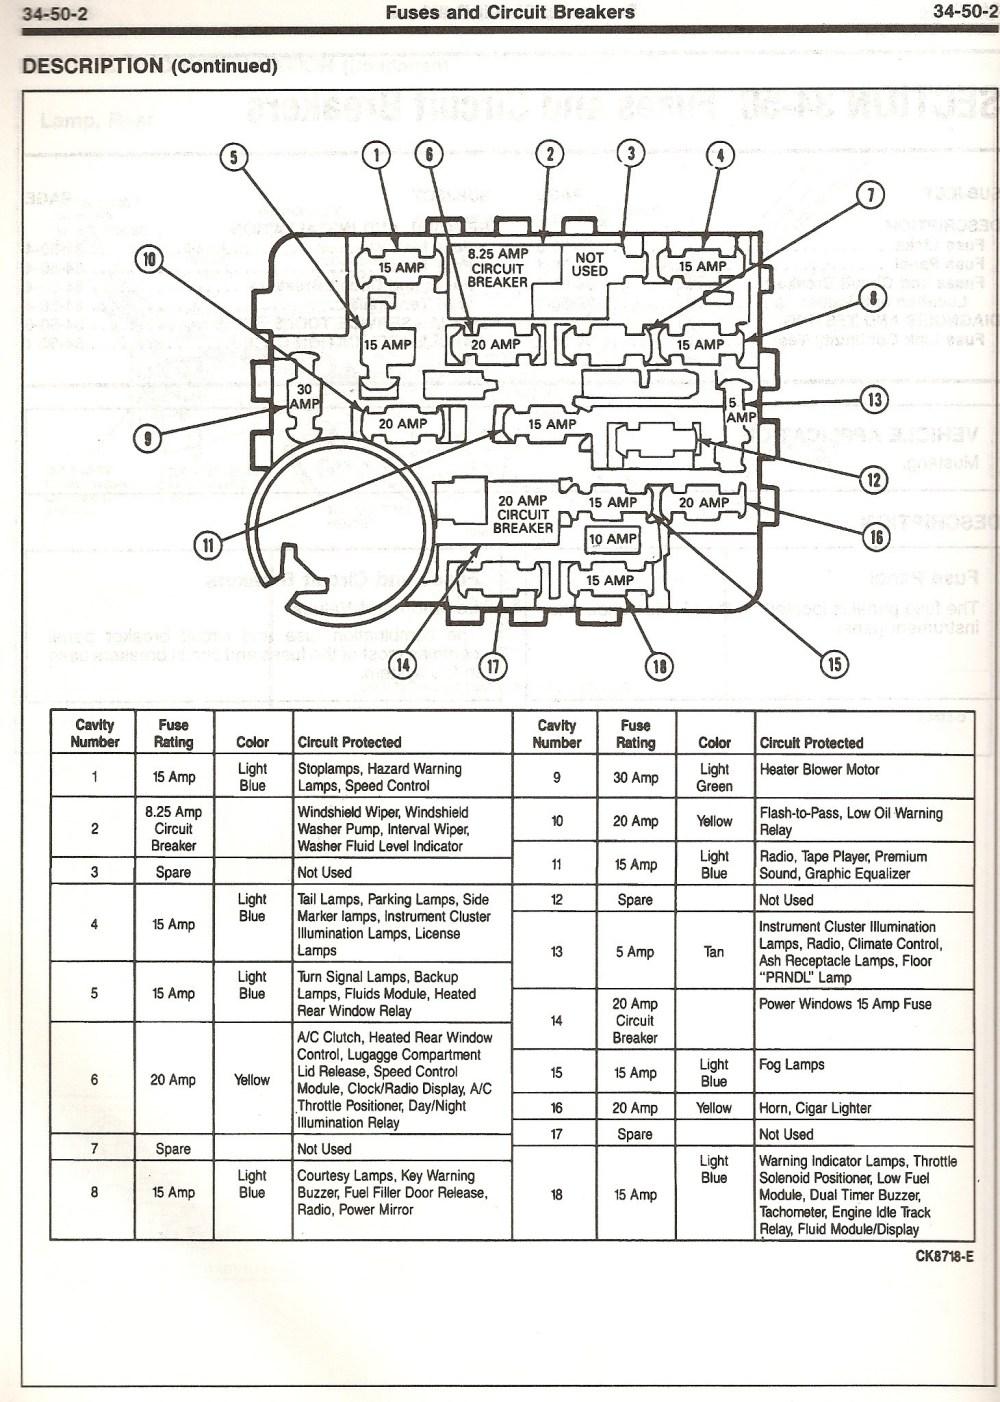 medium resolution of 1992 mercury topaz fuse box diagram wiring schematic wiringwrg 3124 1986 tempo fuse box 1992